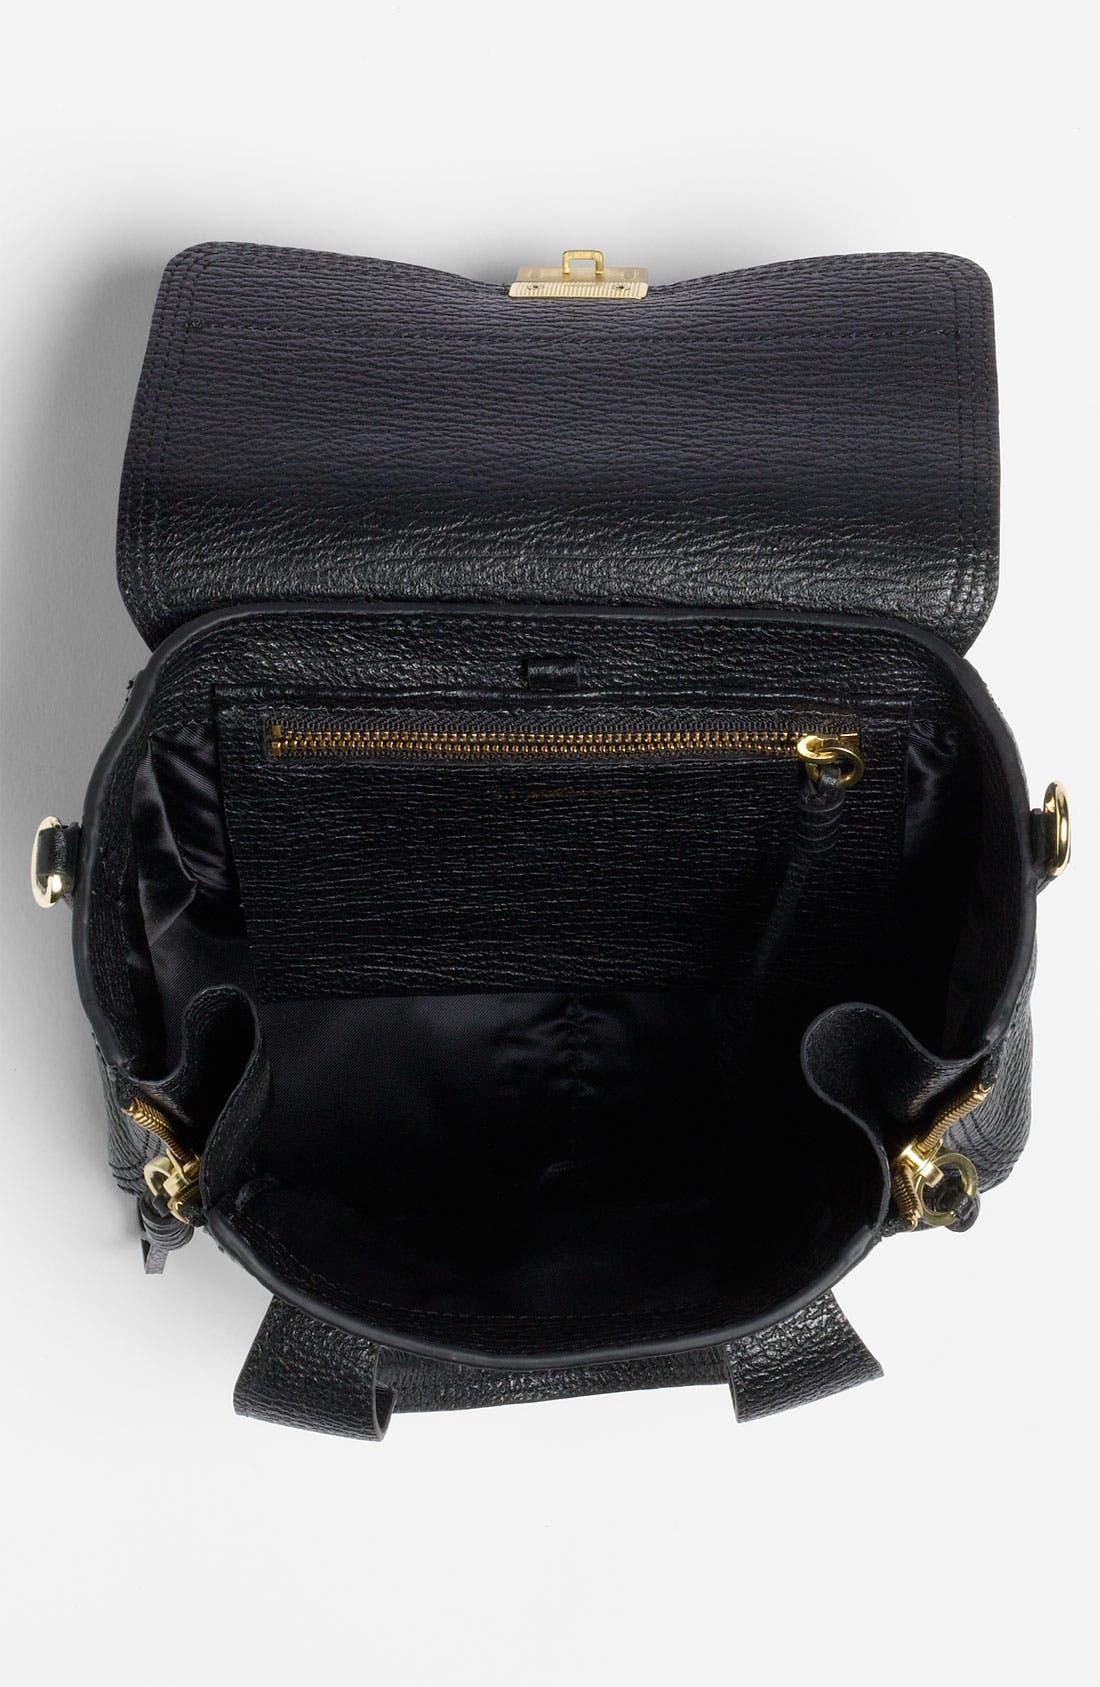 Alternate Image 3  - 3.1 Phillip Lim 'Mini Pashli' Leather Satchel